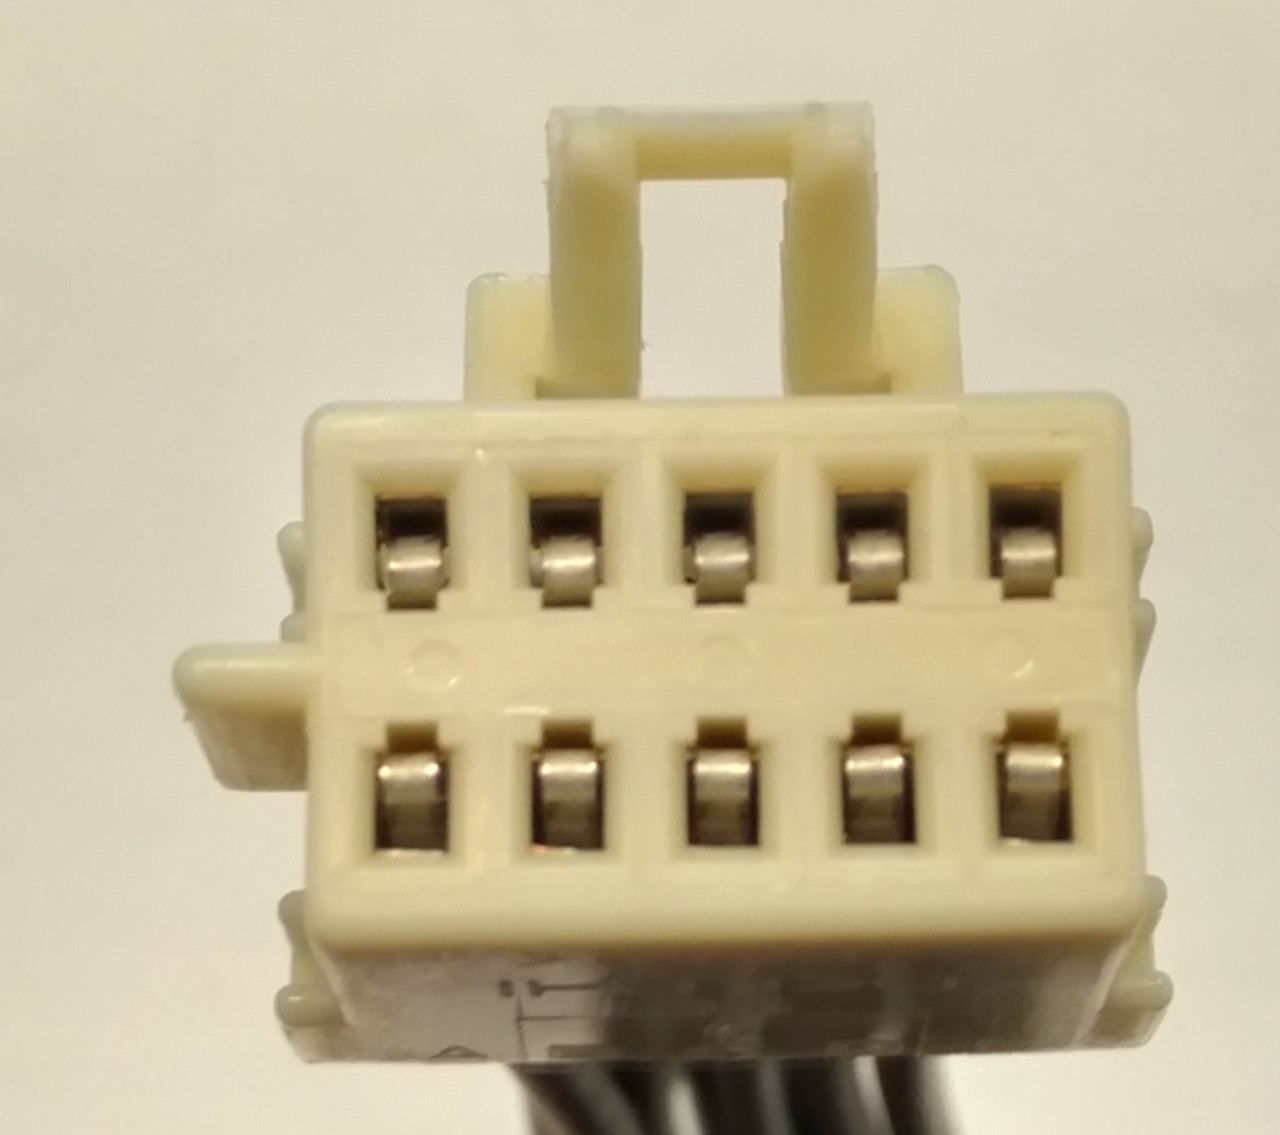 Polaris control module wiring harness connector